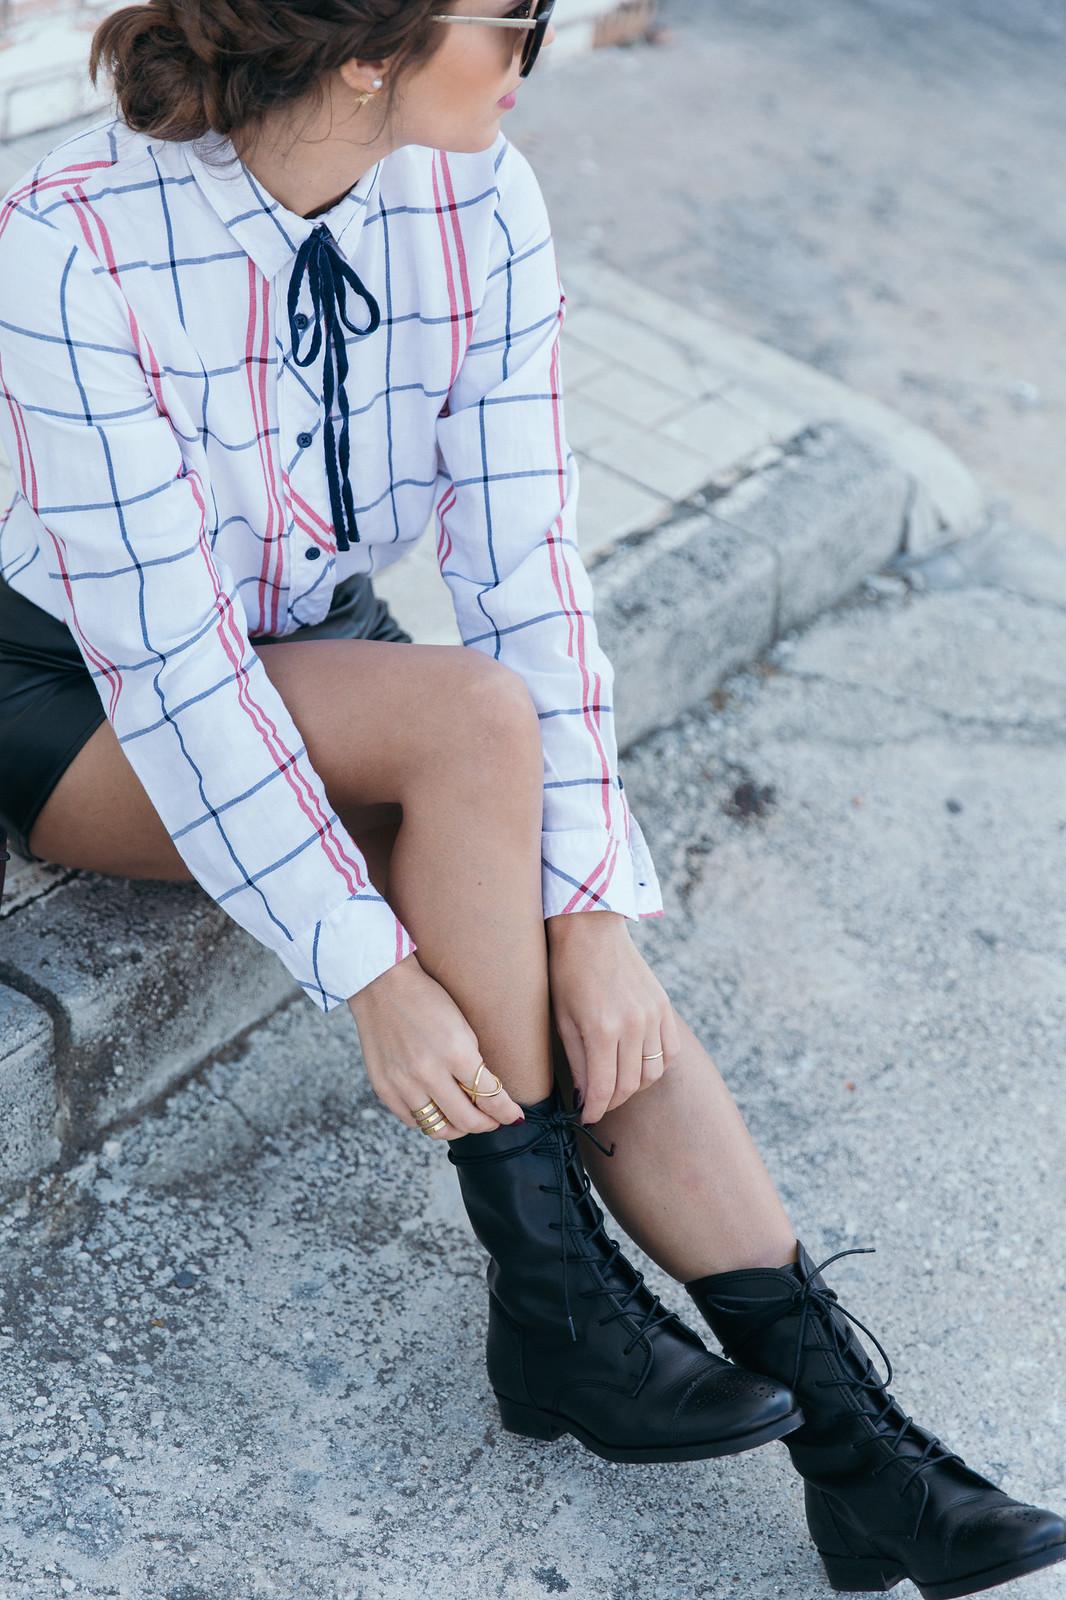 Jessie Chanes Seams for a desire - Black Boots Itshoes Parfois bag faux leather skirt-14